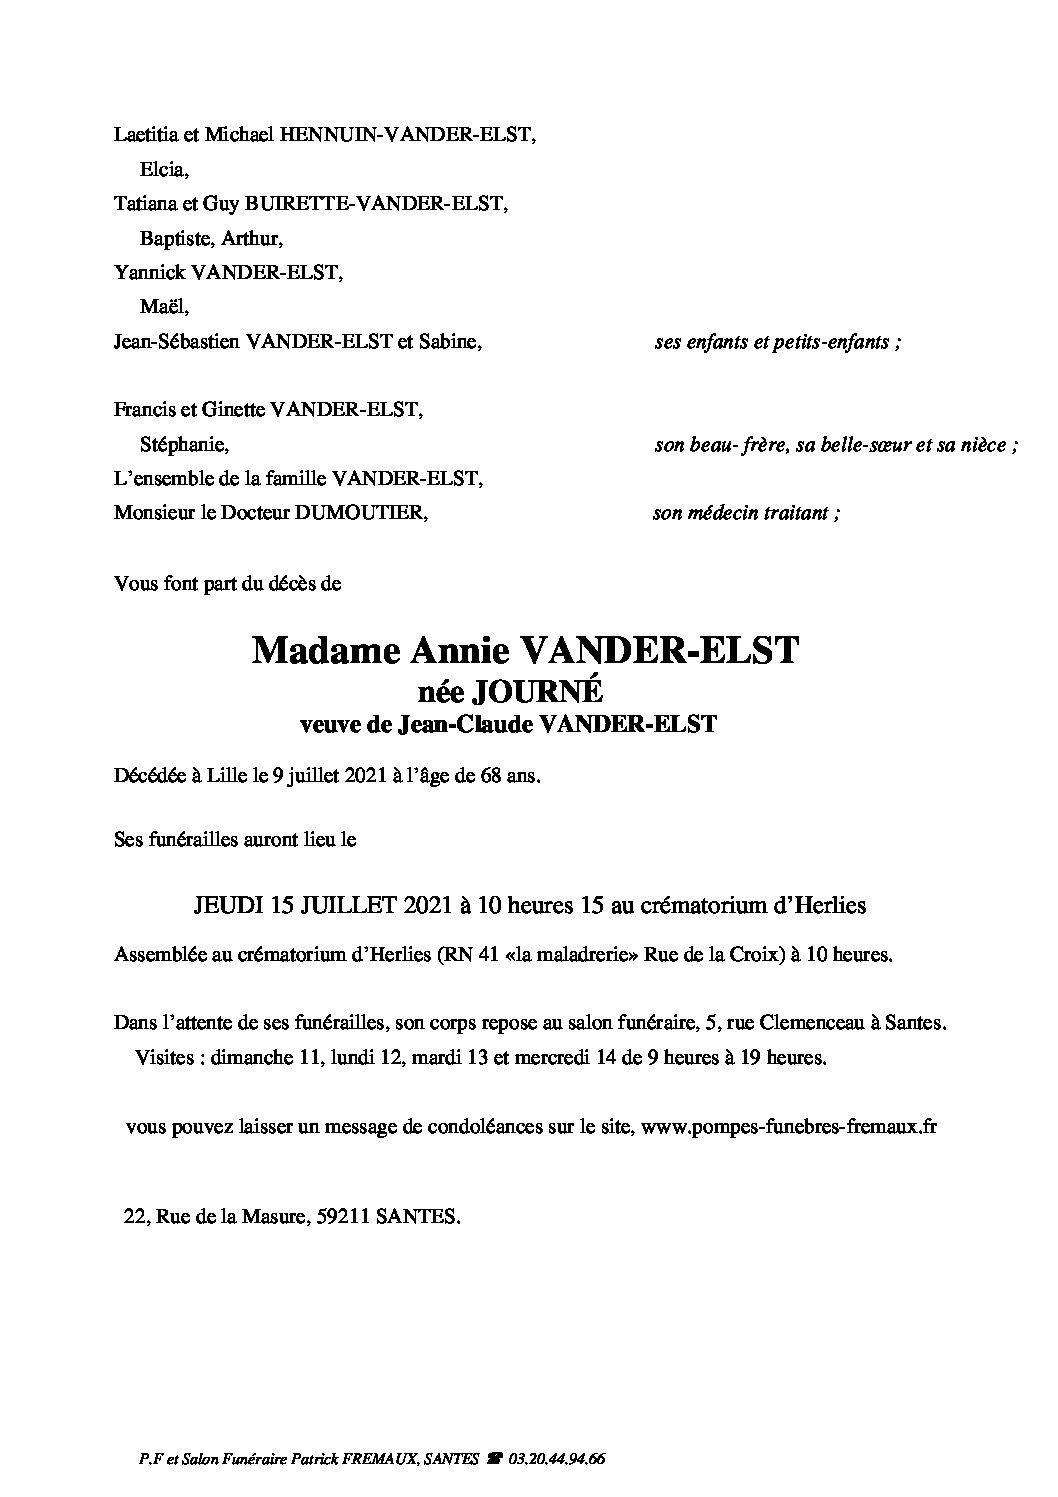 Madame Annie VANDER-ELST née JOURNÉ